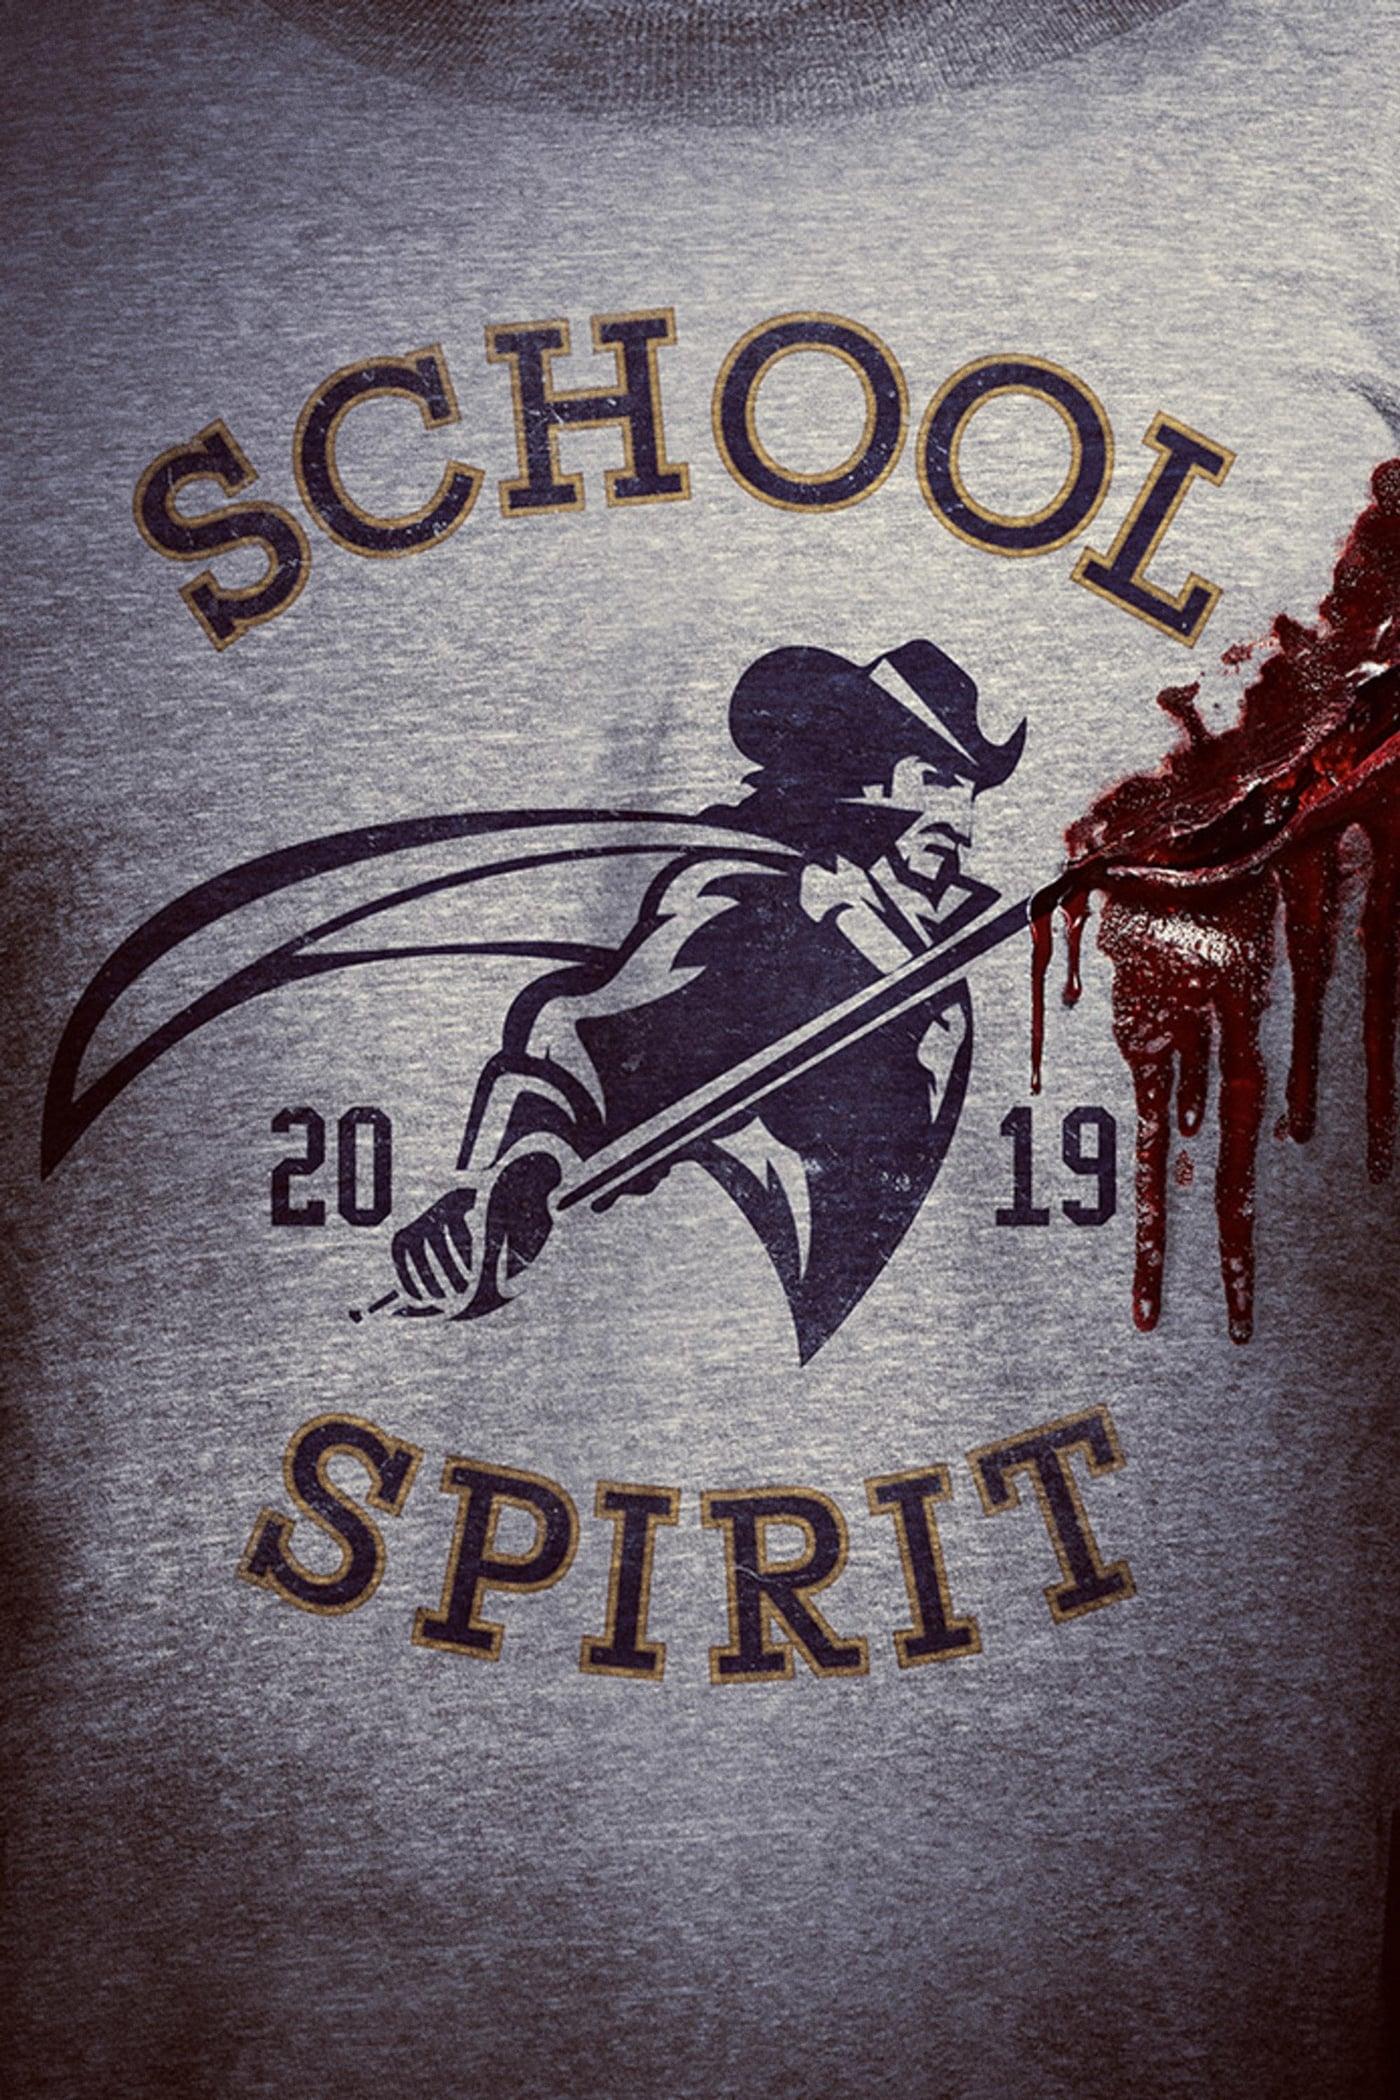 School Spirit (2019)